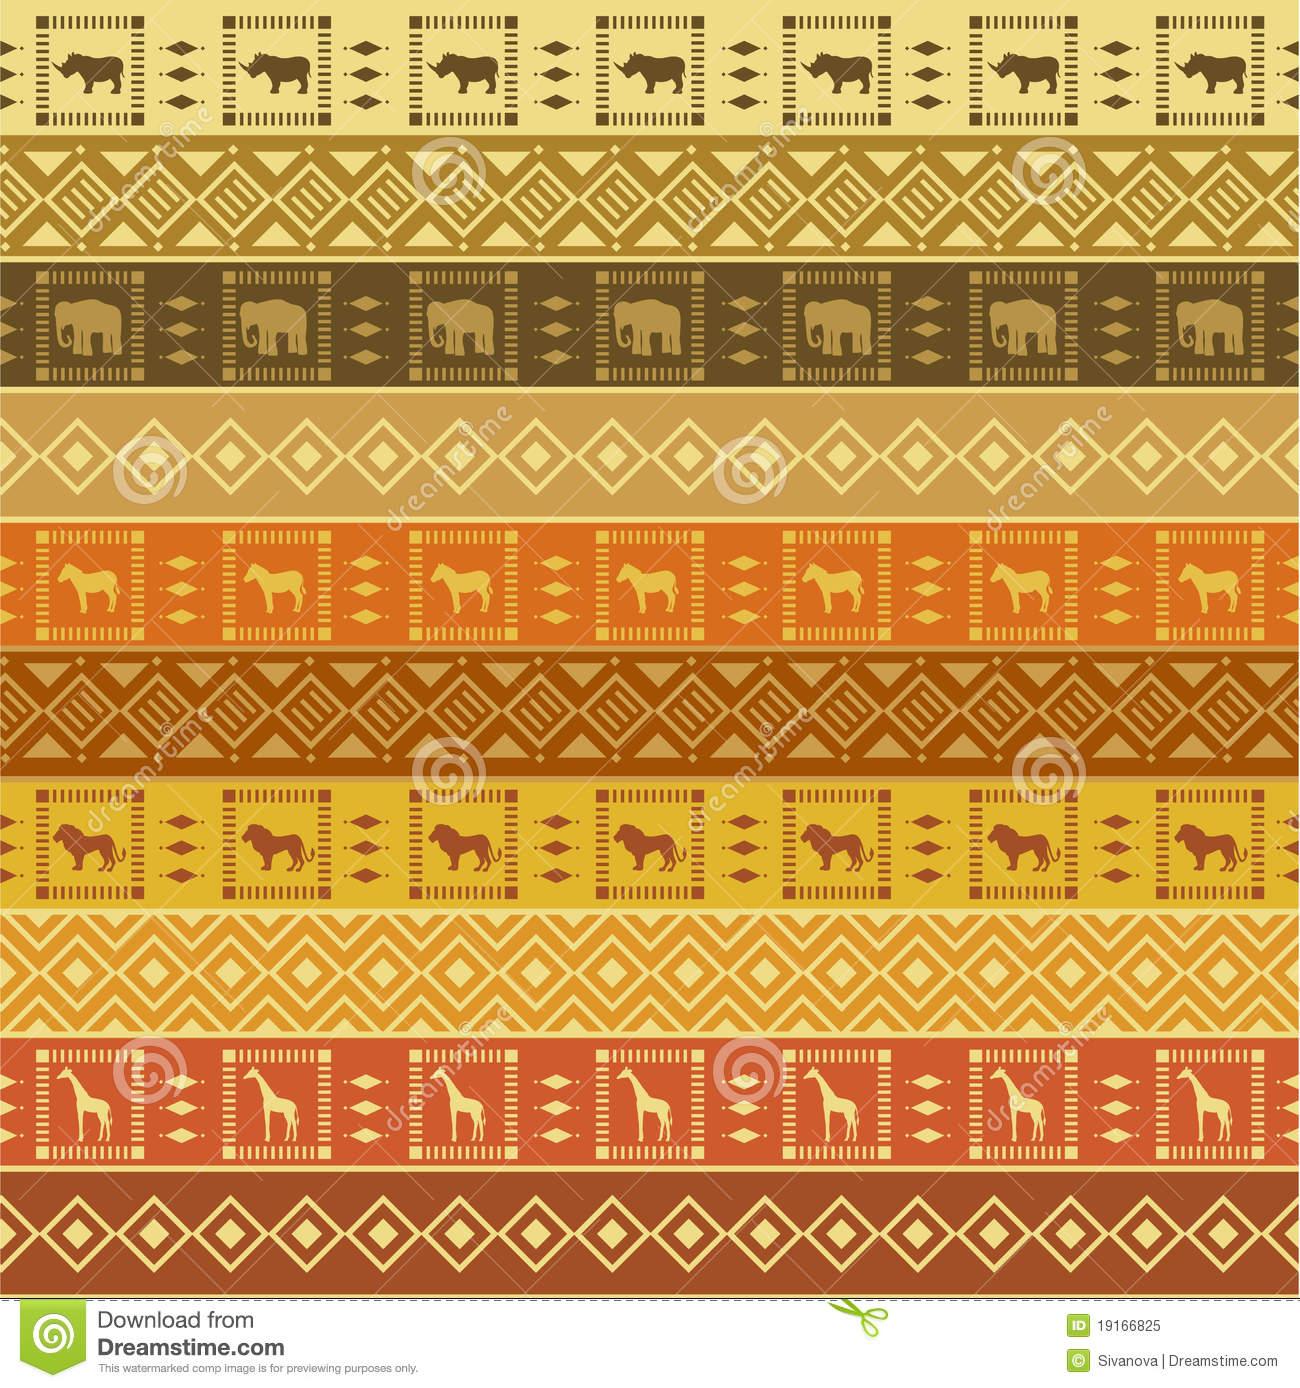 Safari Pattern Wallpaper photo - 9